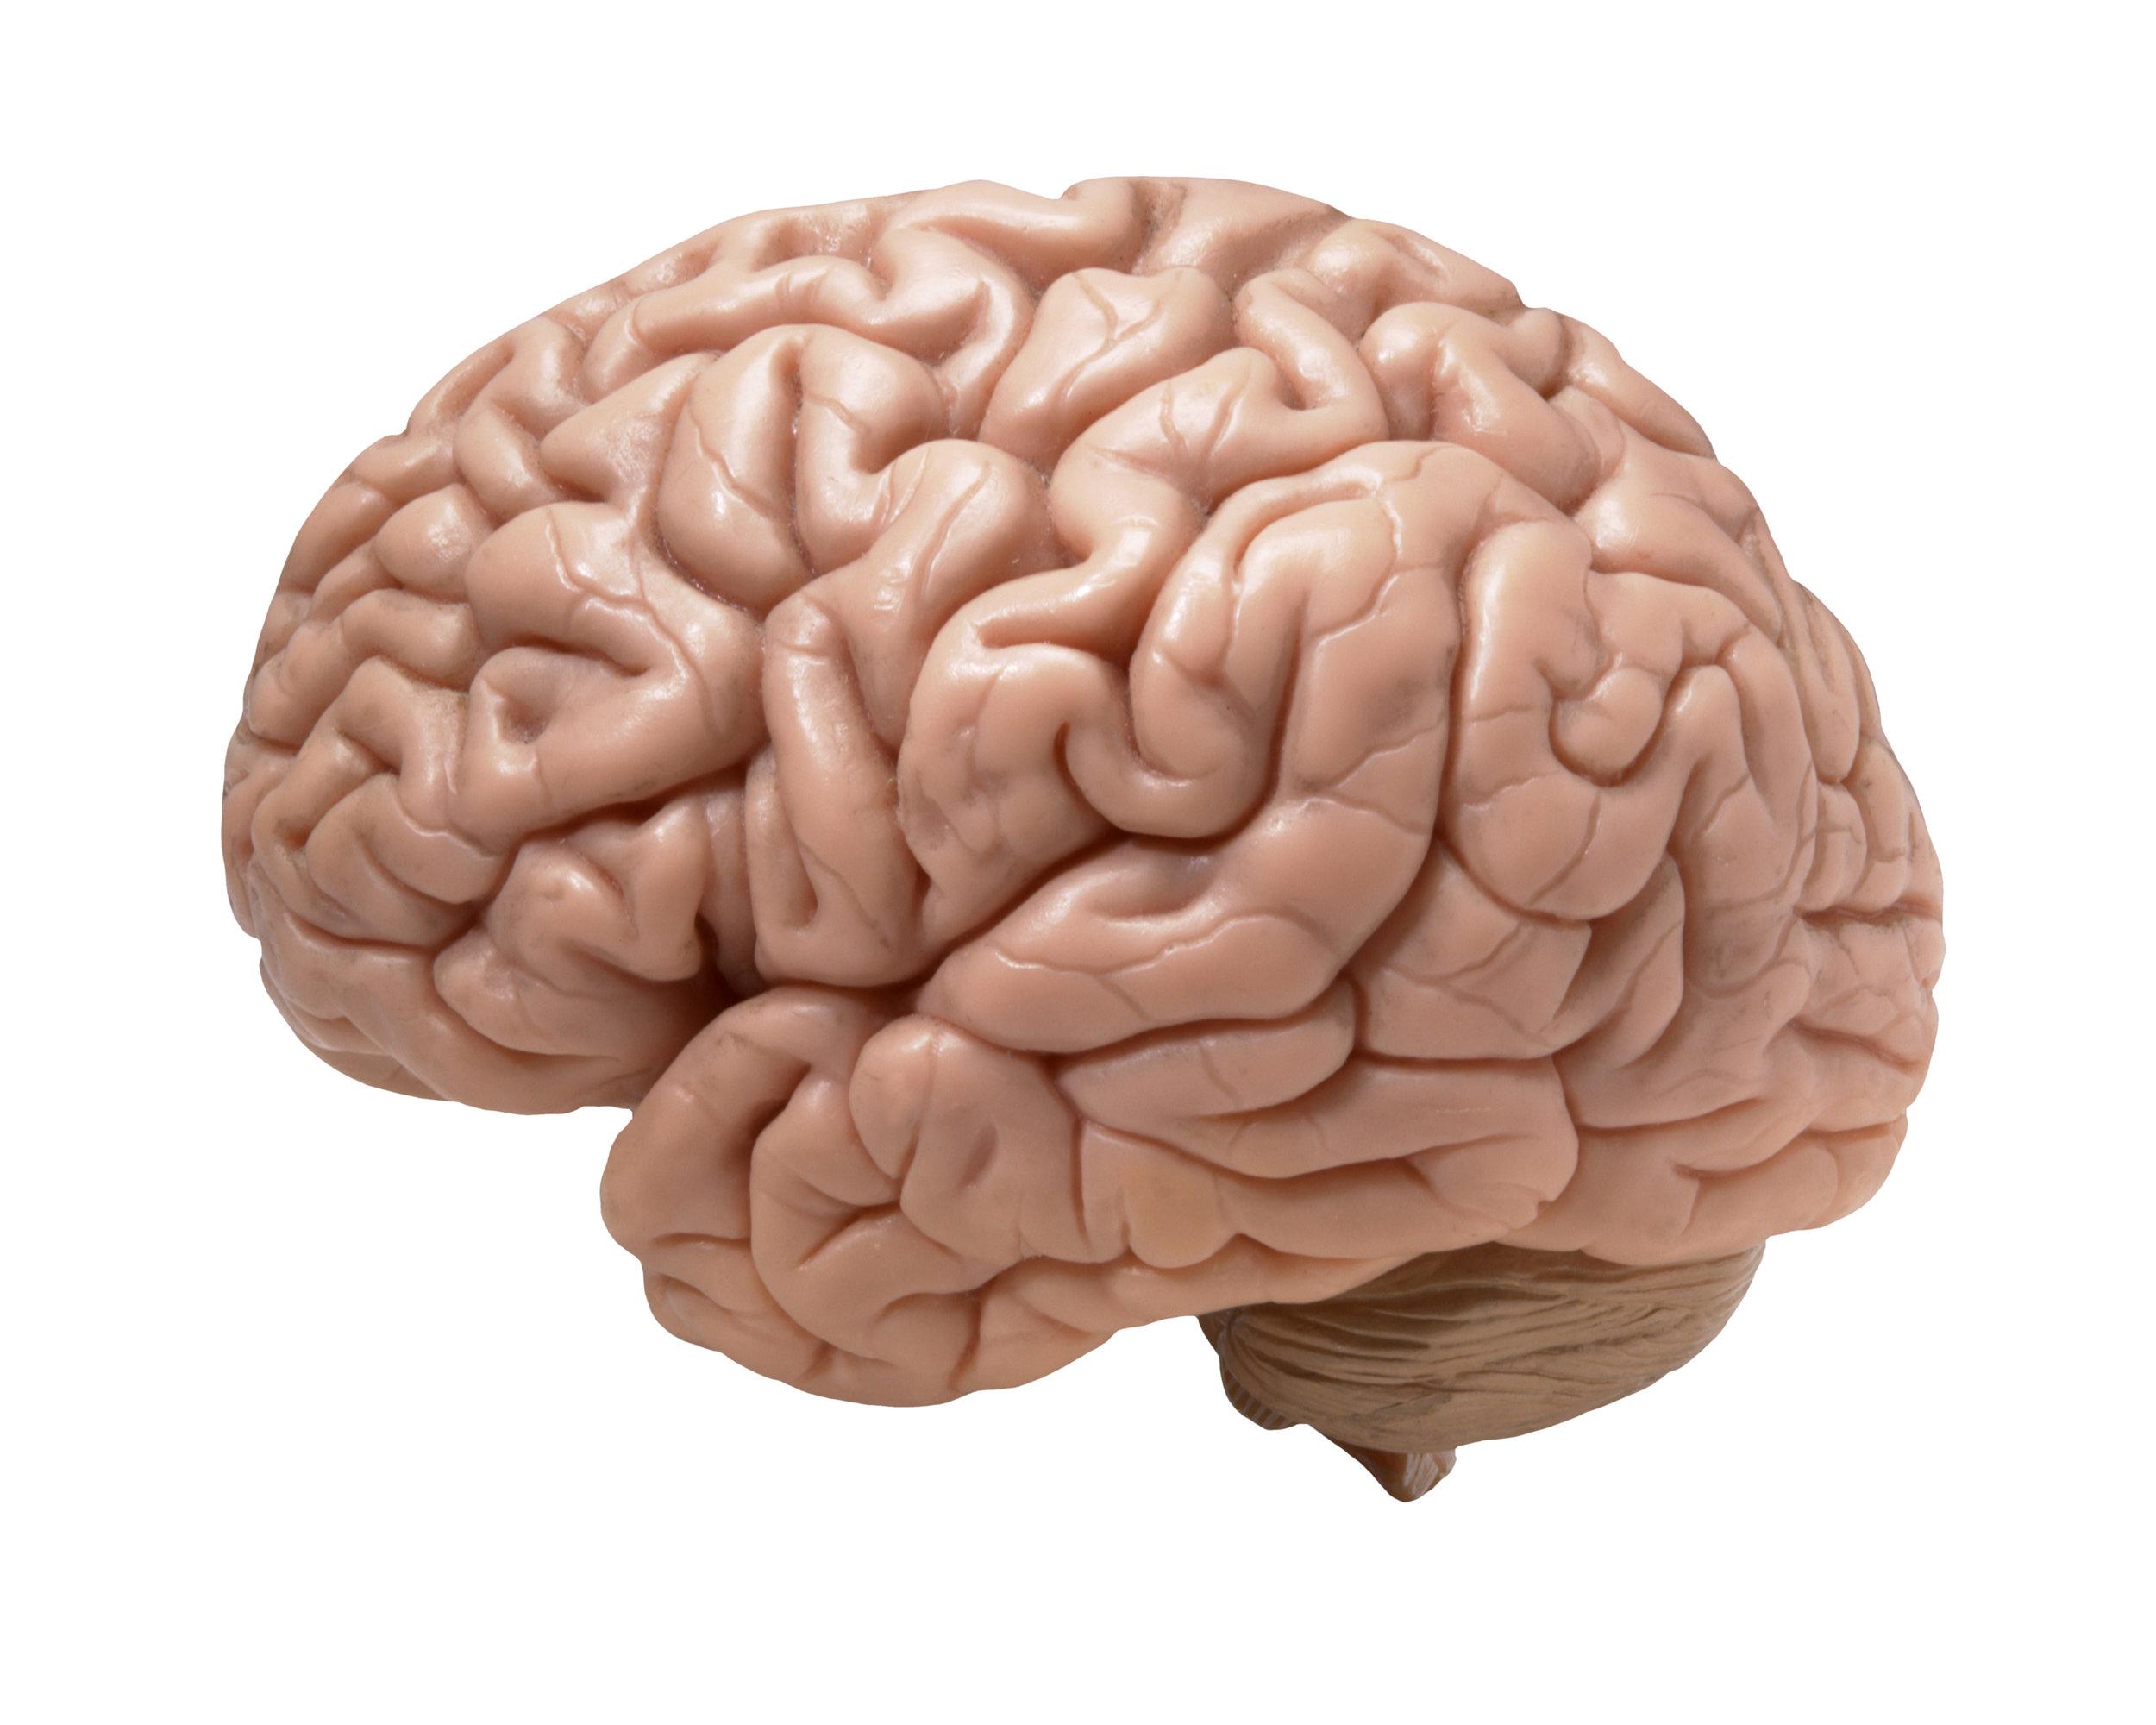 phosphatidylserine is found in the human brain naturally